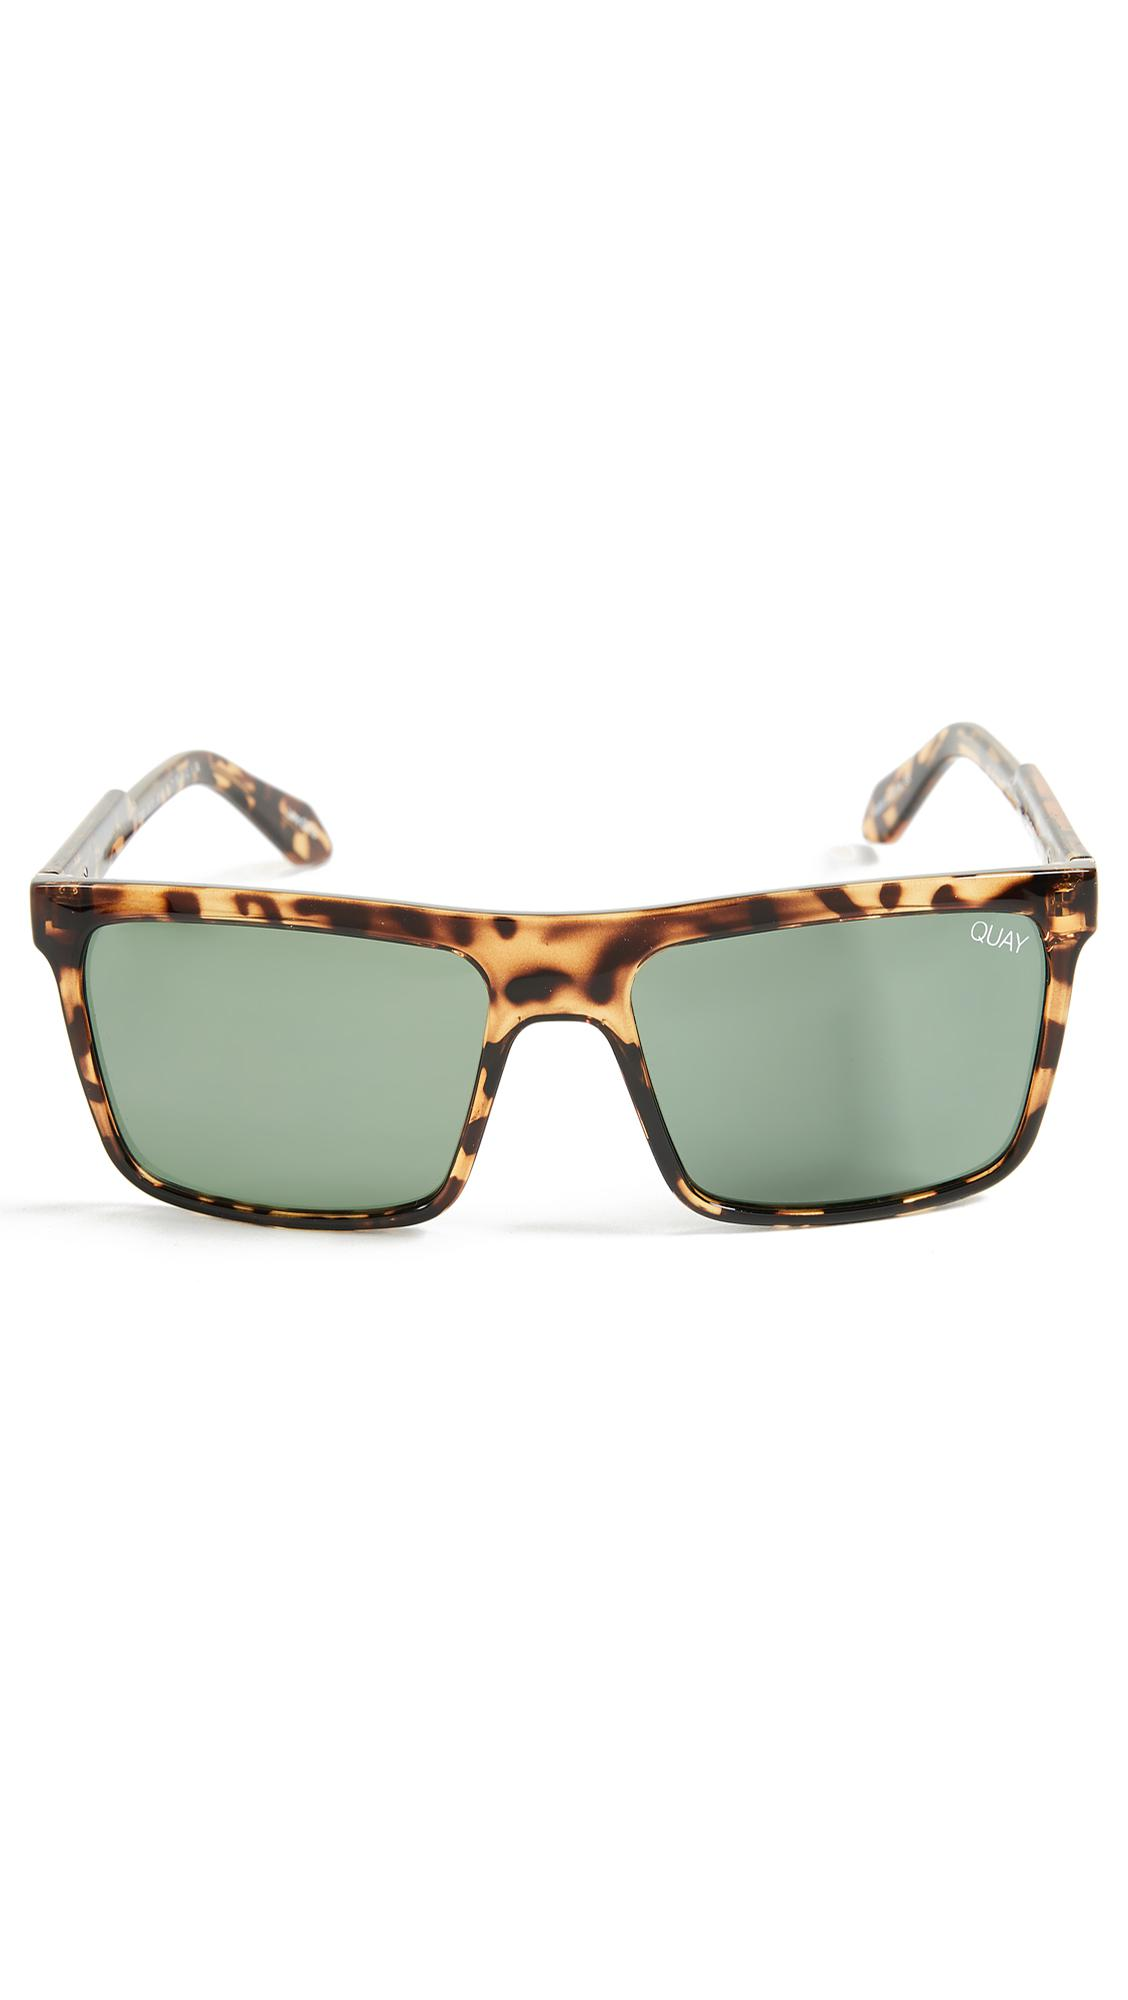 c83a576a92 Lyst - Quay Let It Run Sunglasses for Men